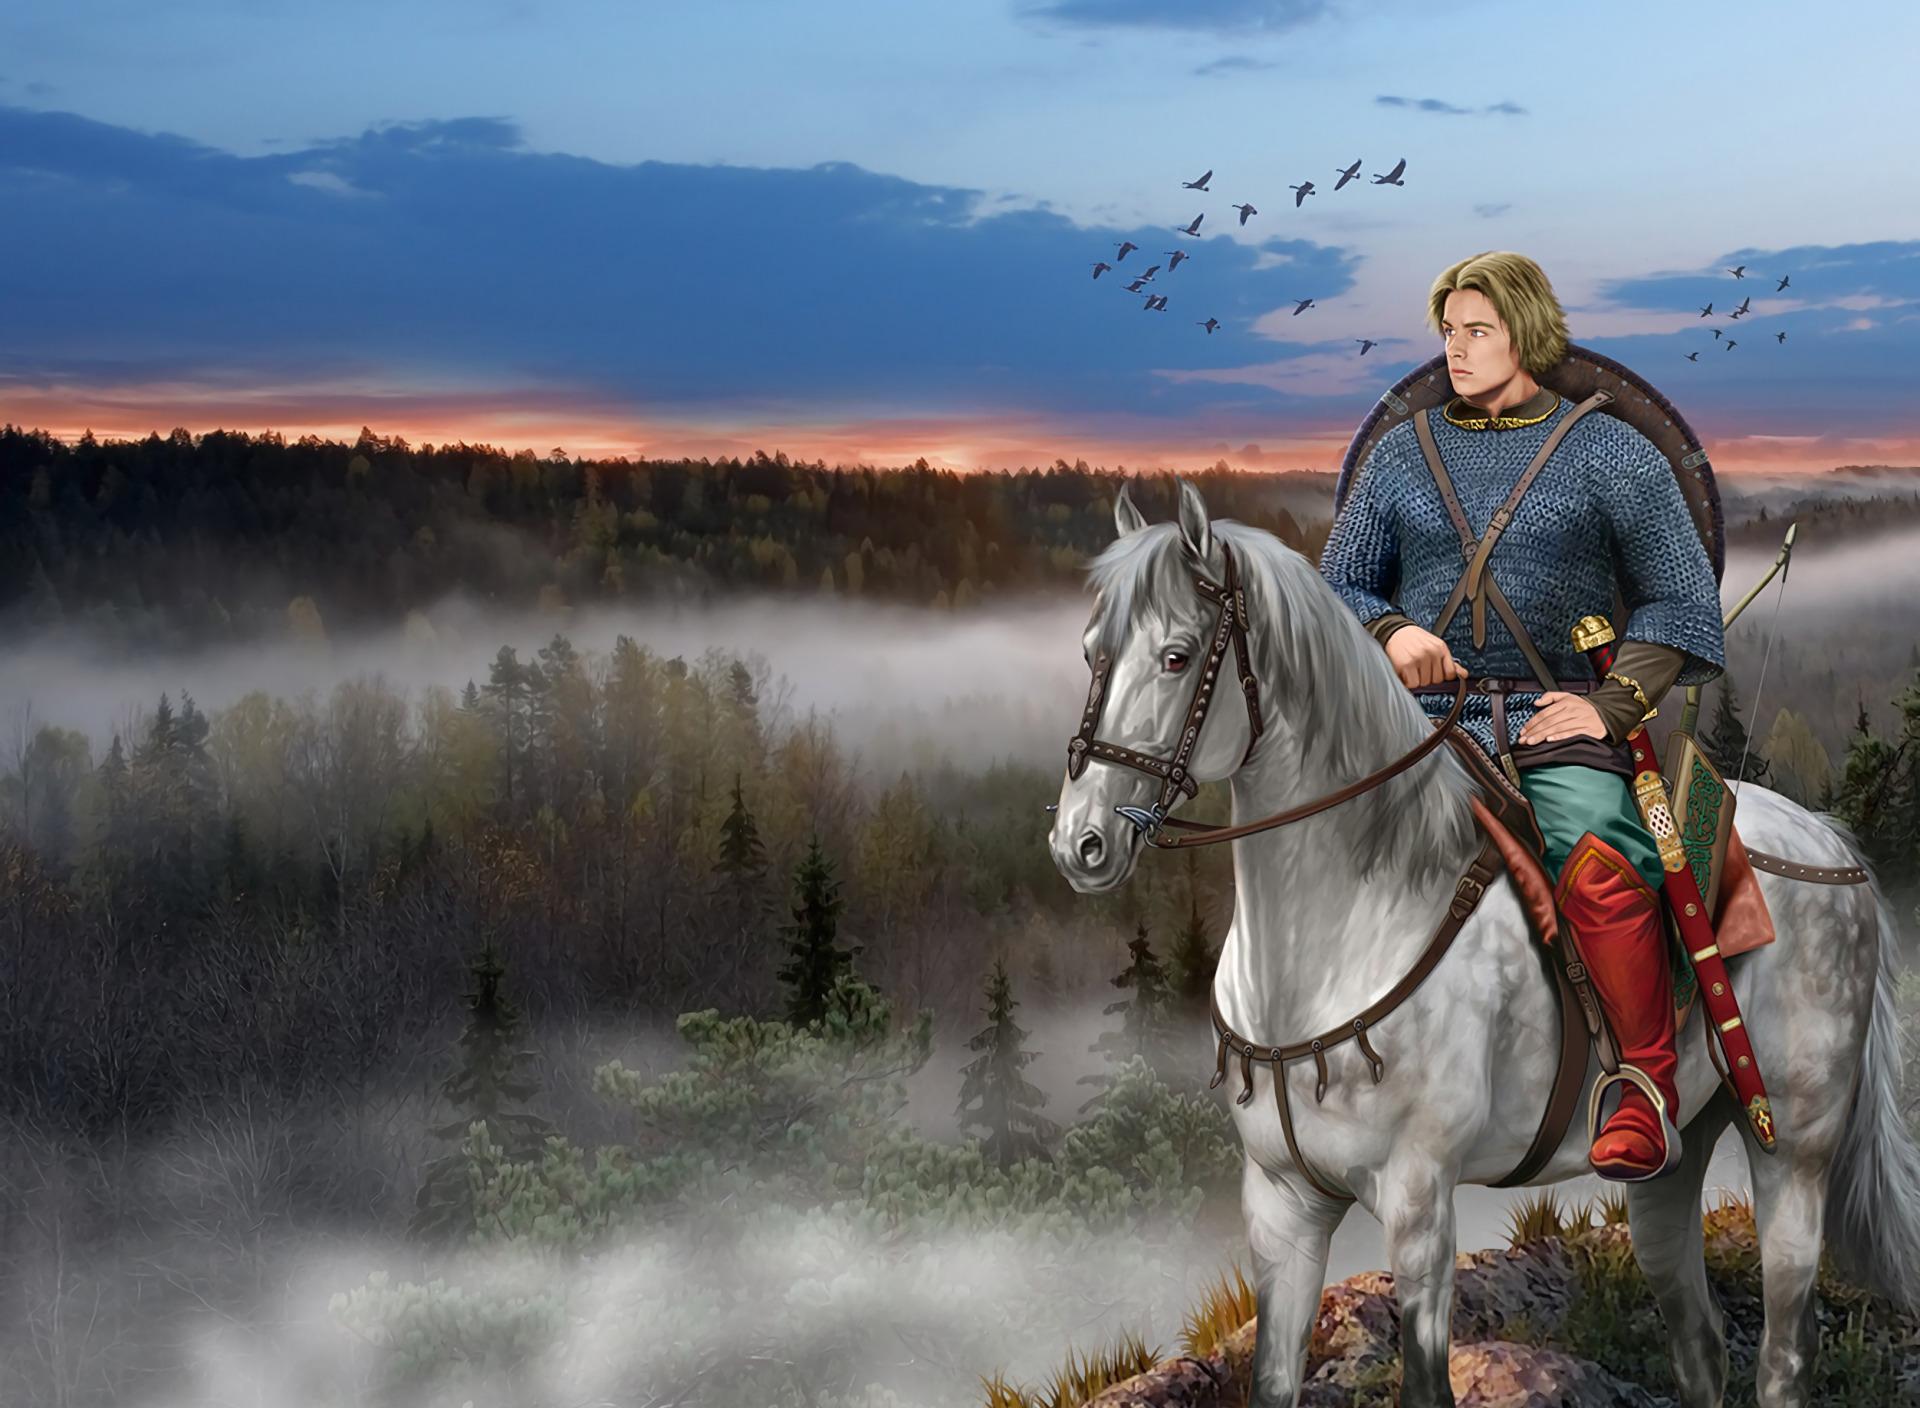 картинки древних воинов верхом на коне